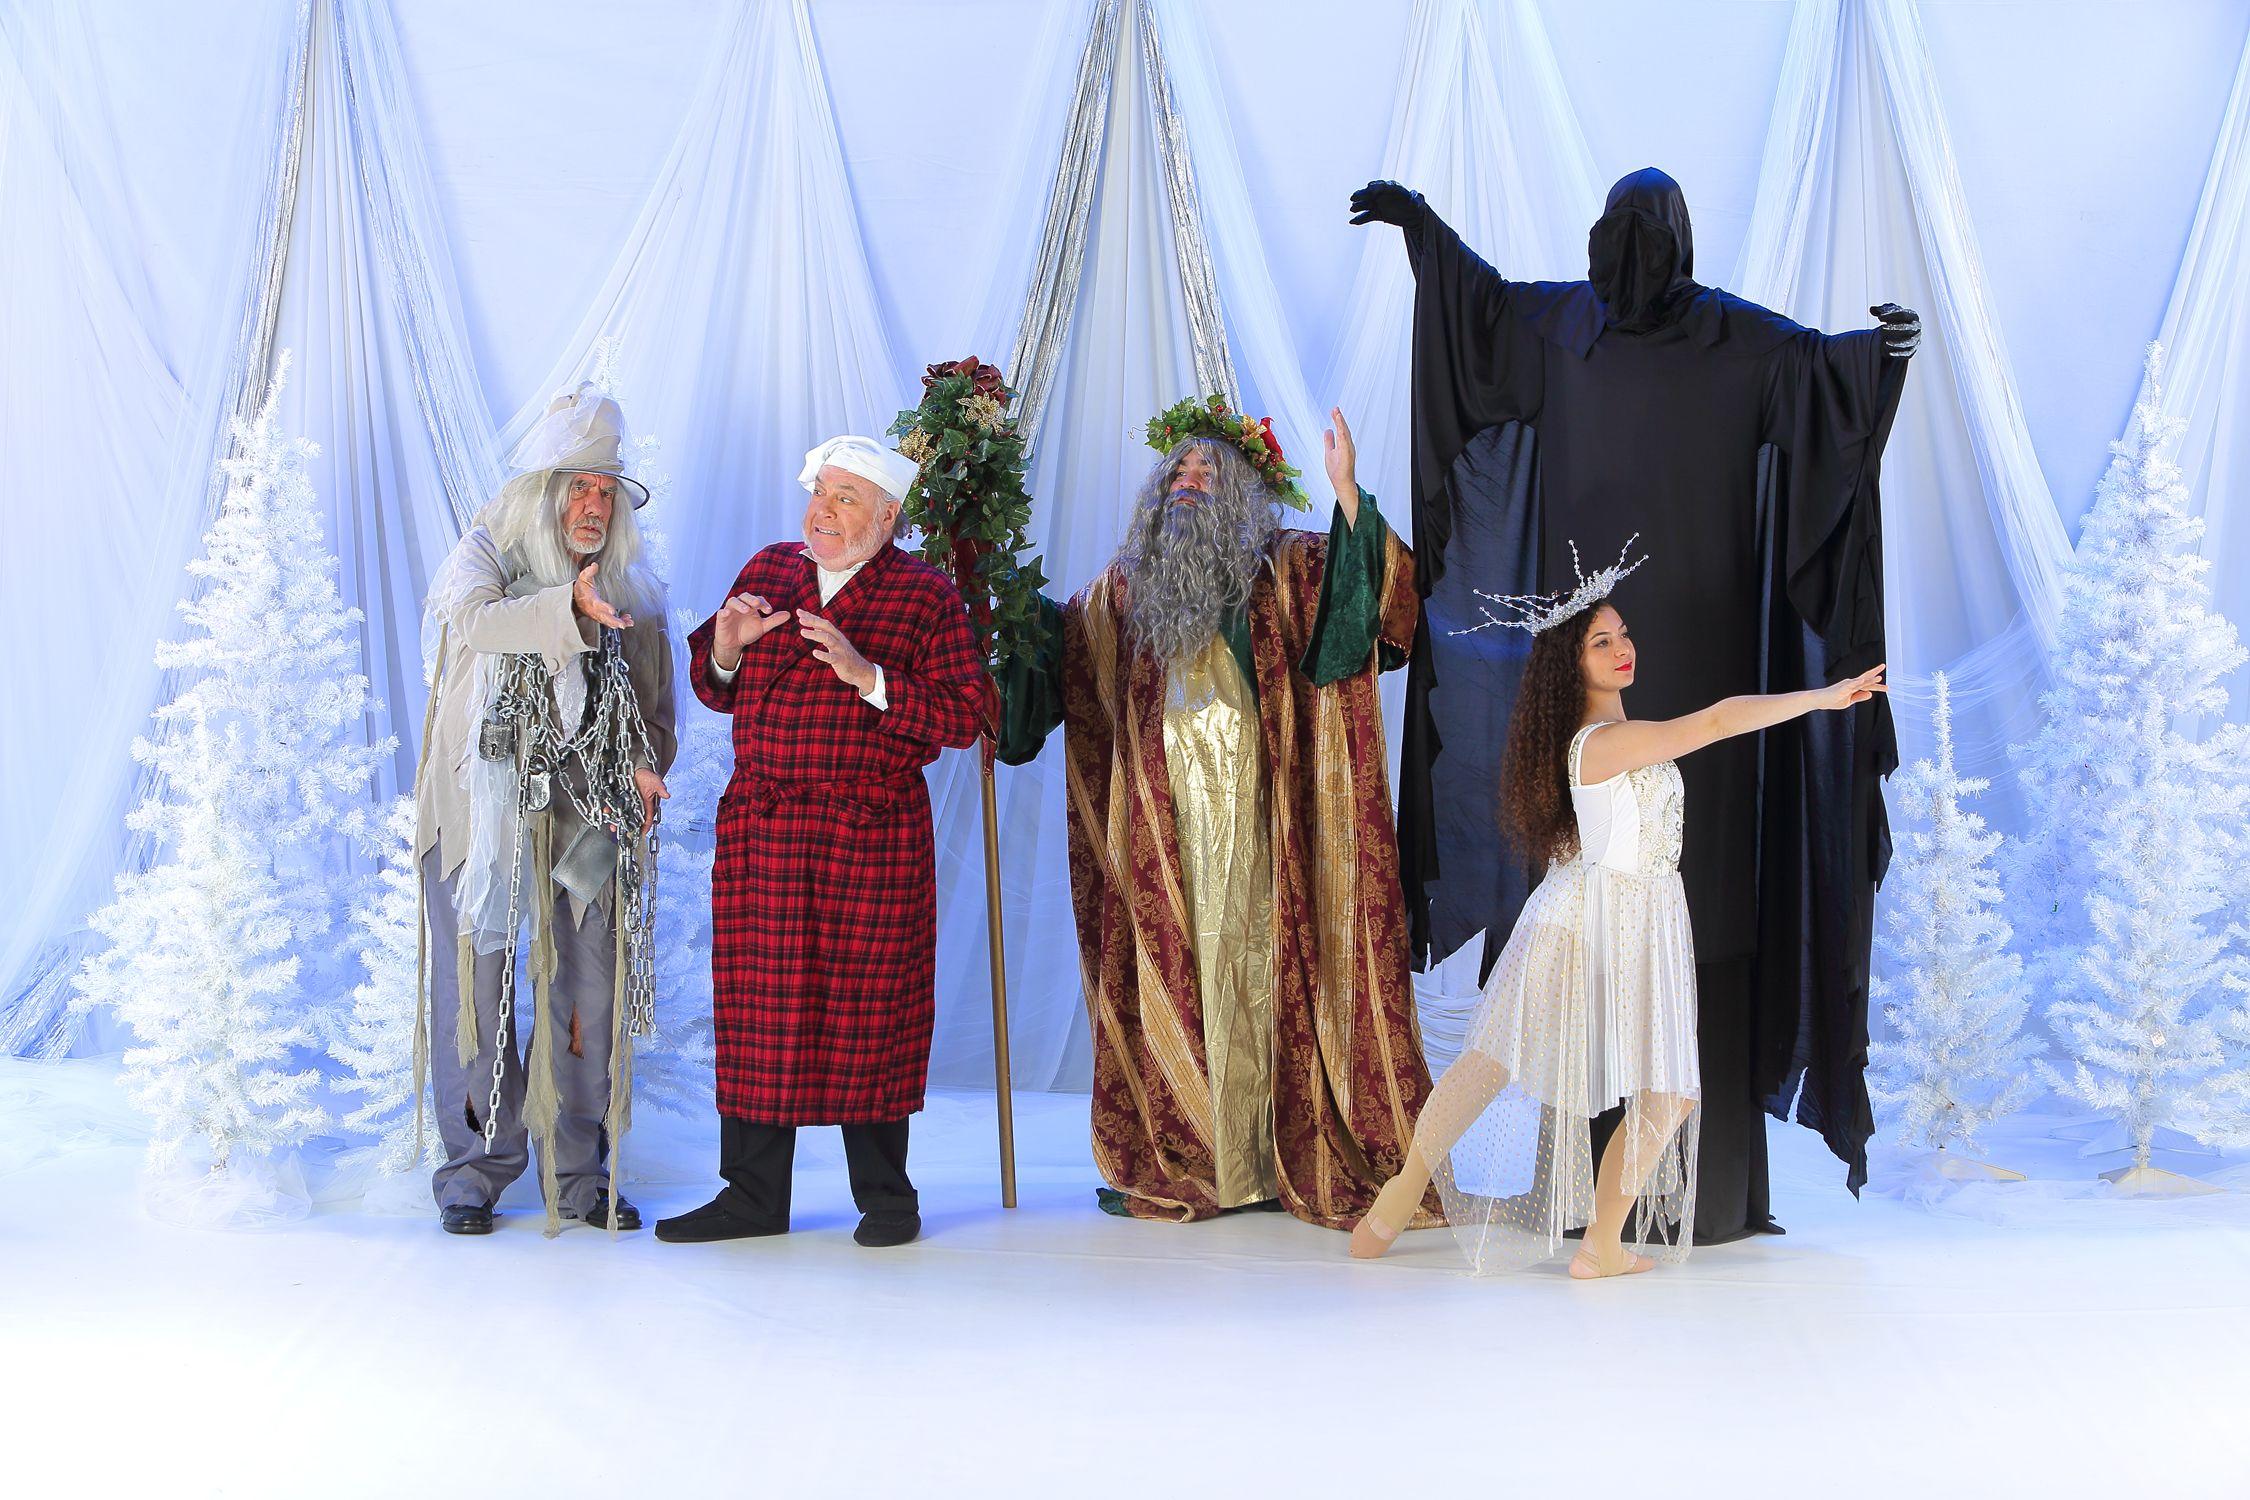 Scrooge, Marley and Christmas Spirit